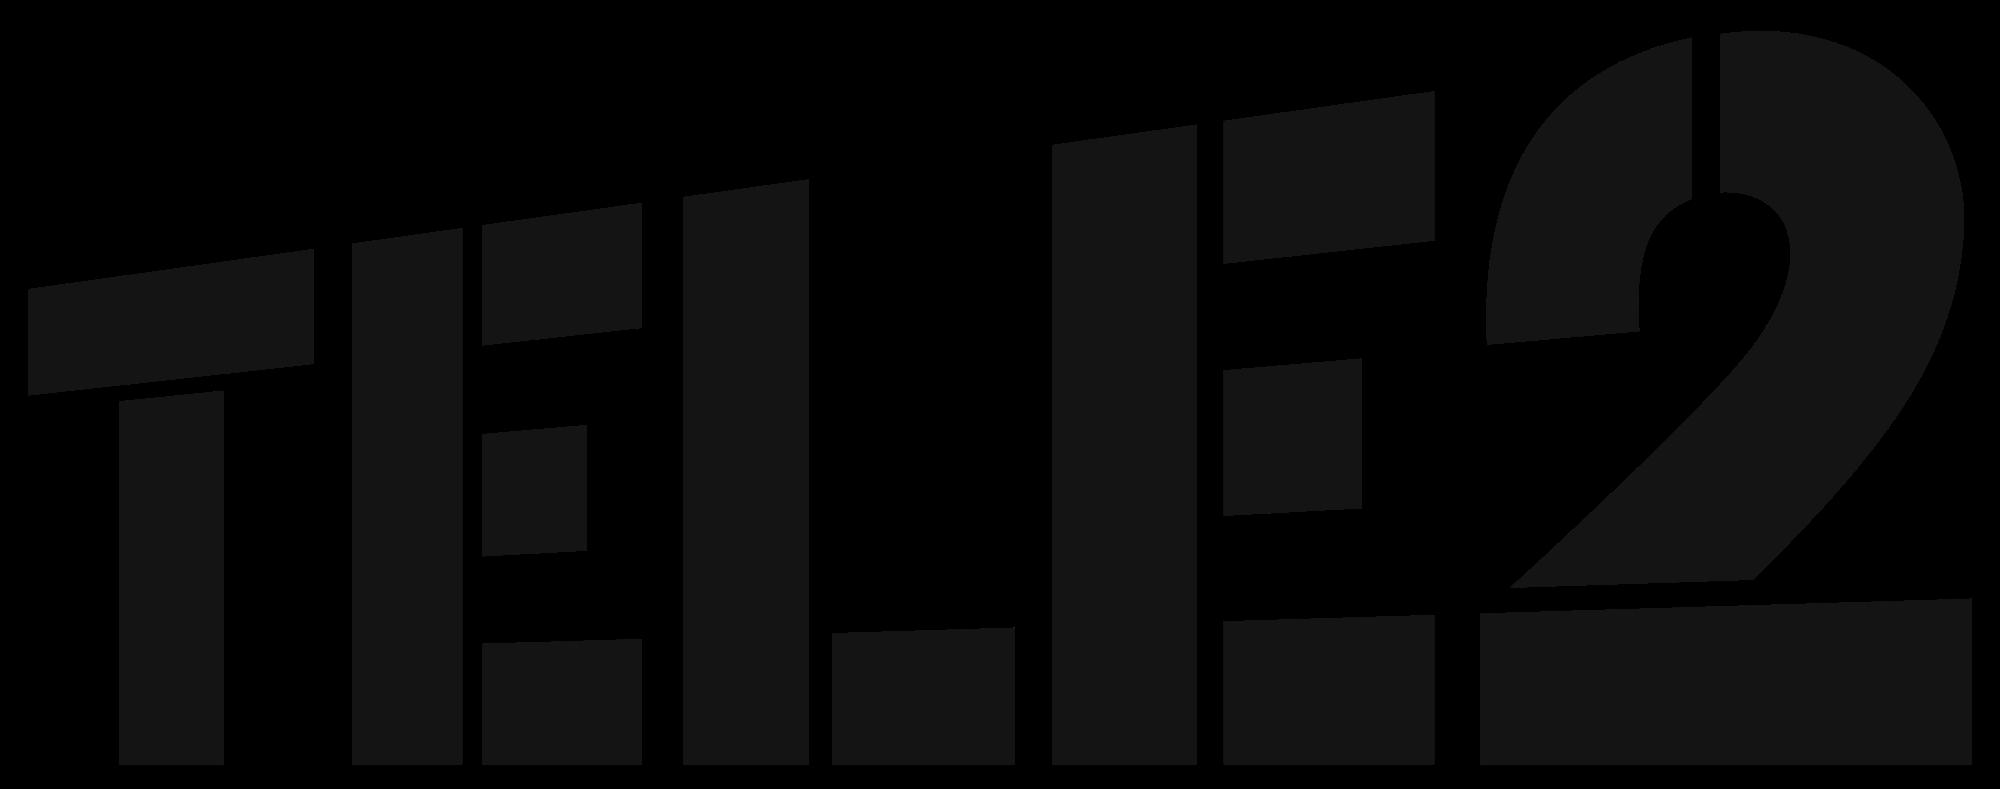 Tele2 - Wikipedia